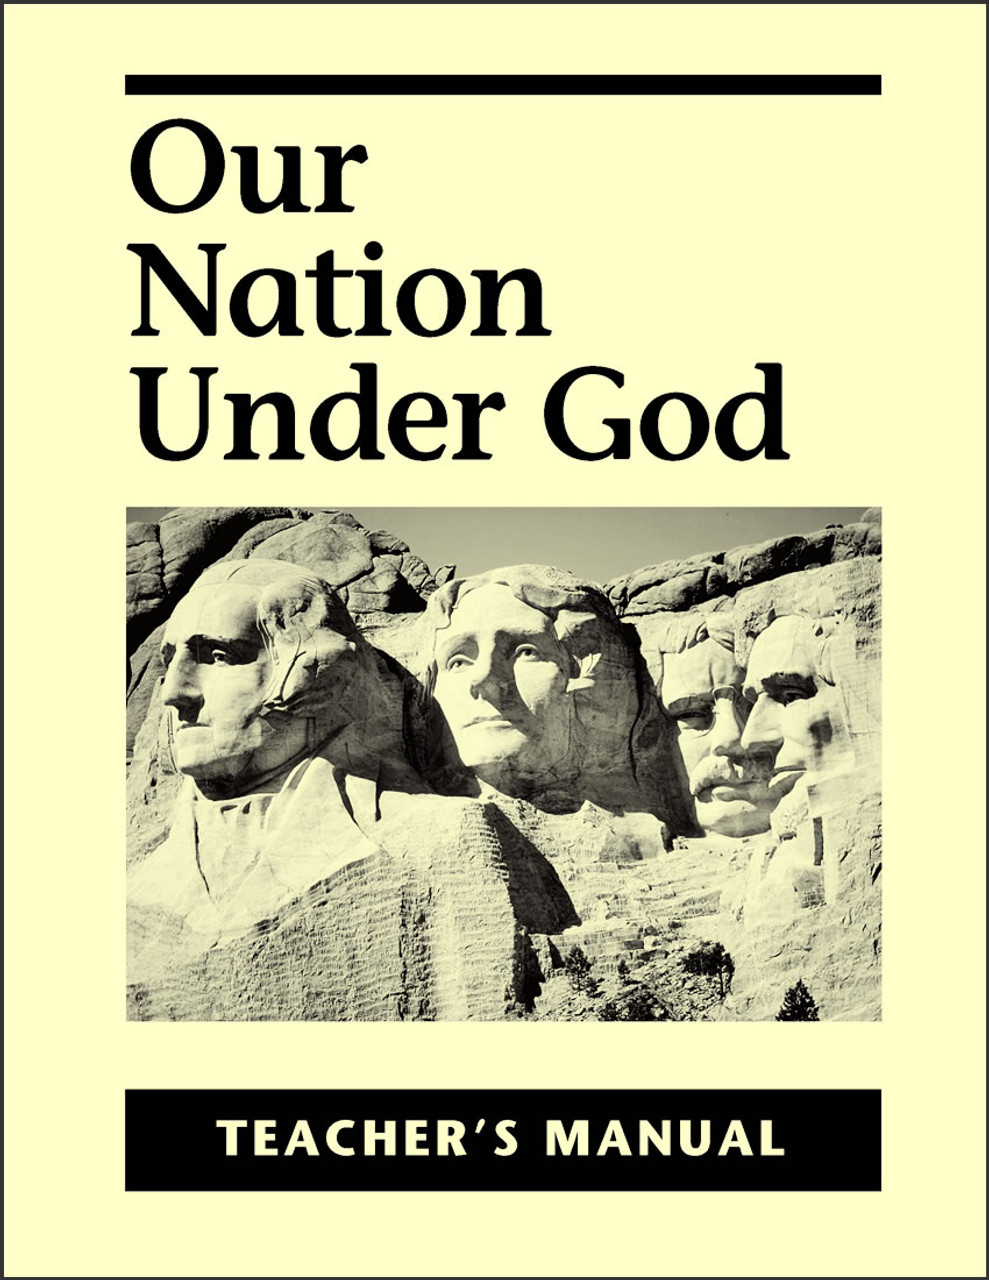 Our Nation Under God - Teacher's Manual